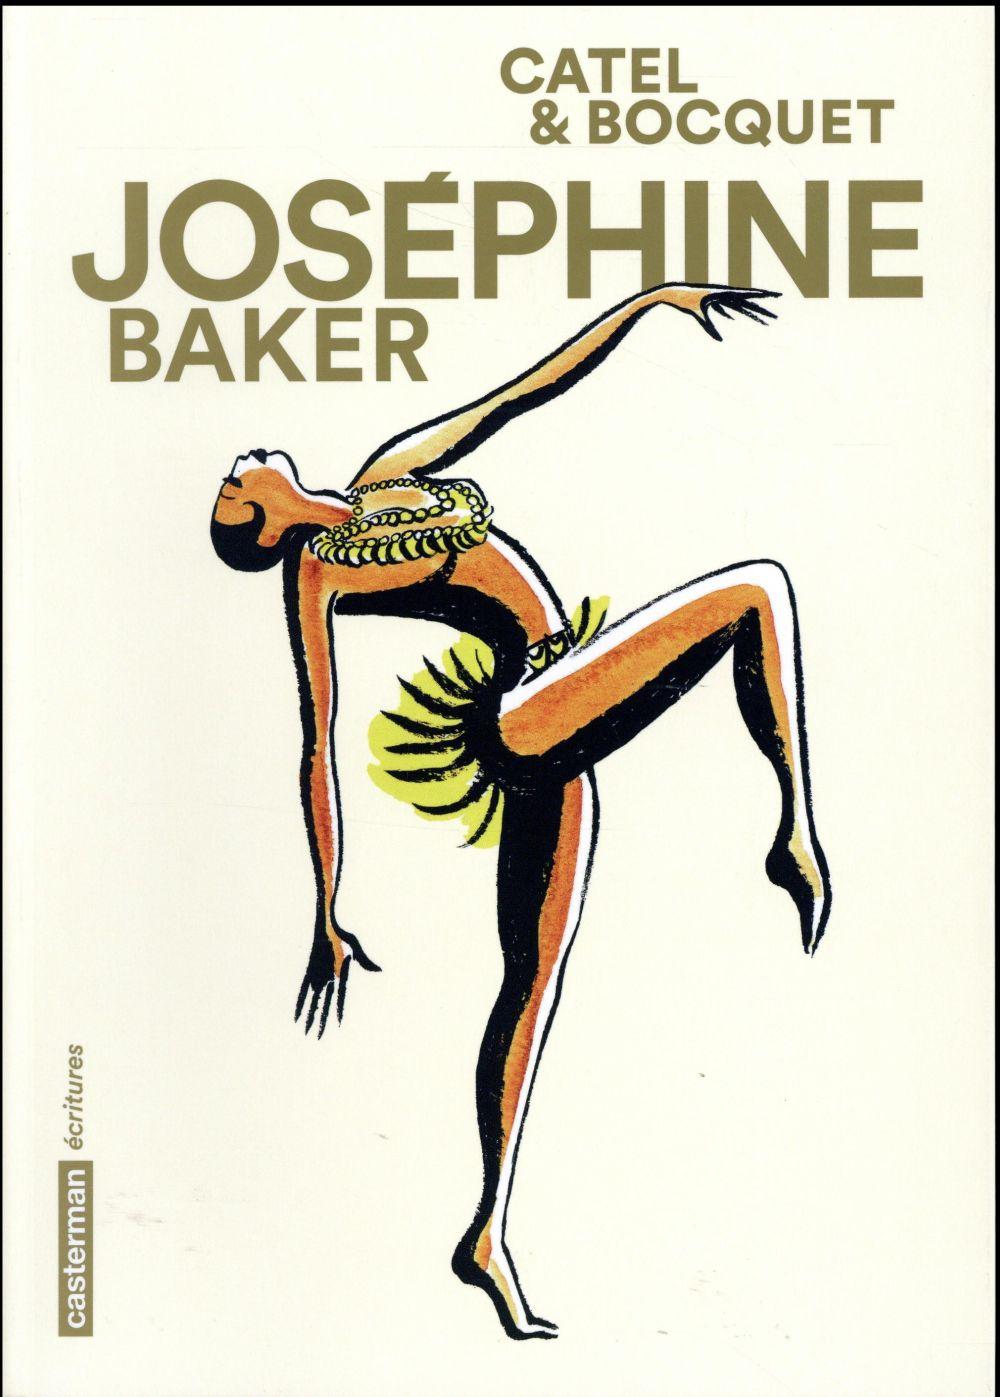 JOSEPHINE BAKER BOCQUET/CATEL CASTERMAN